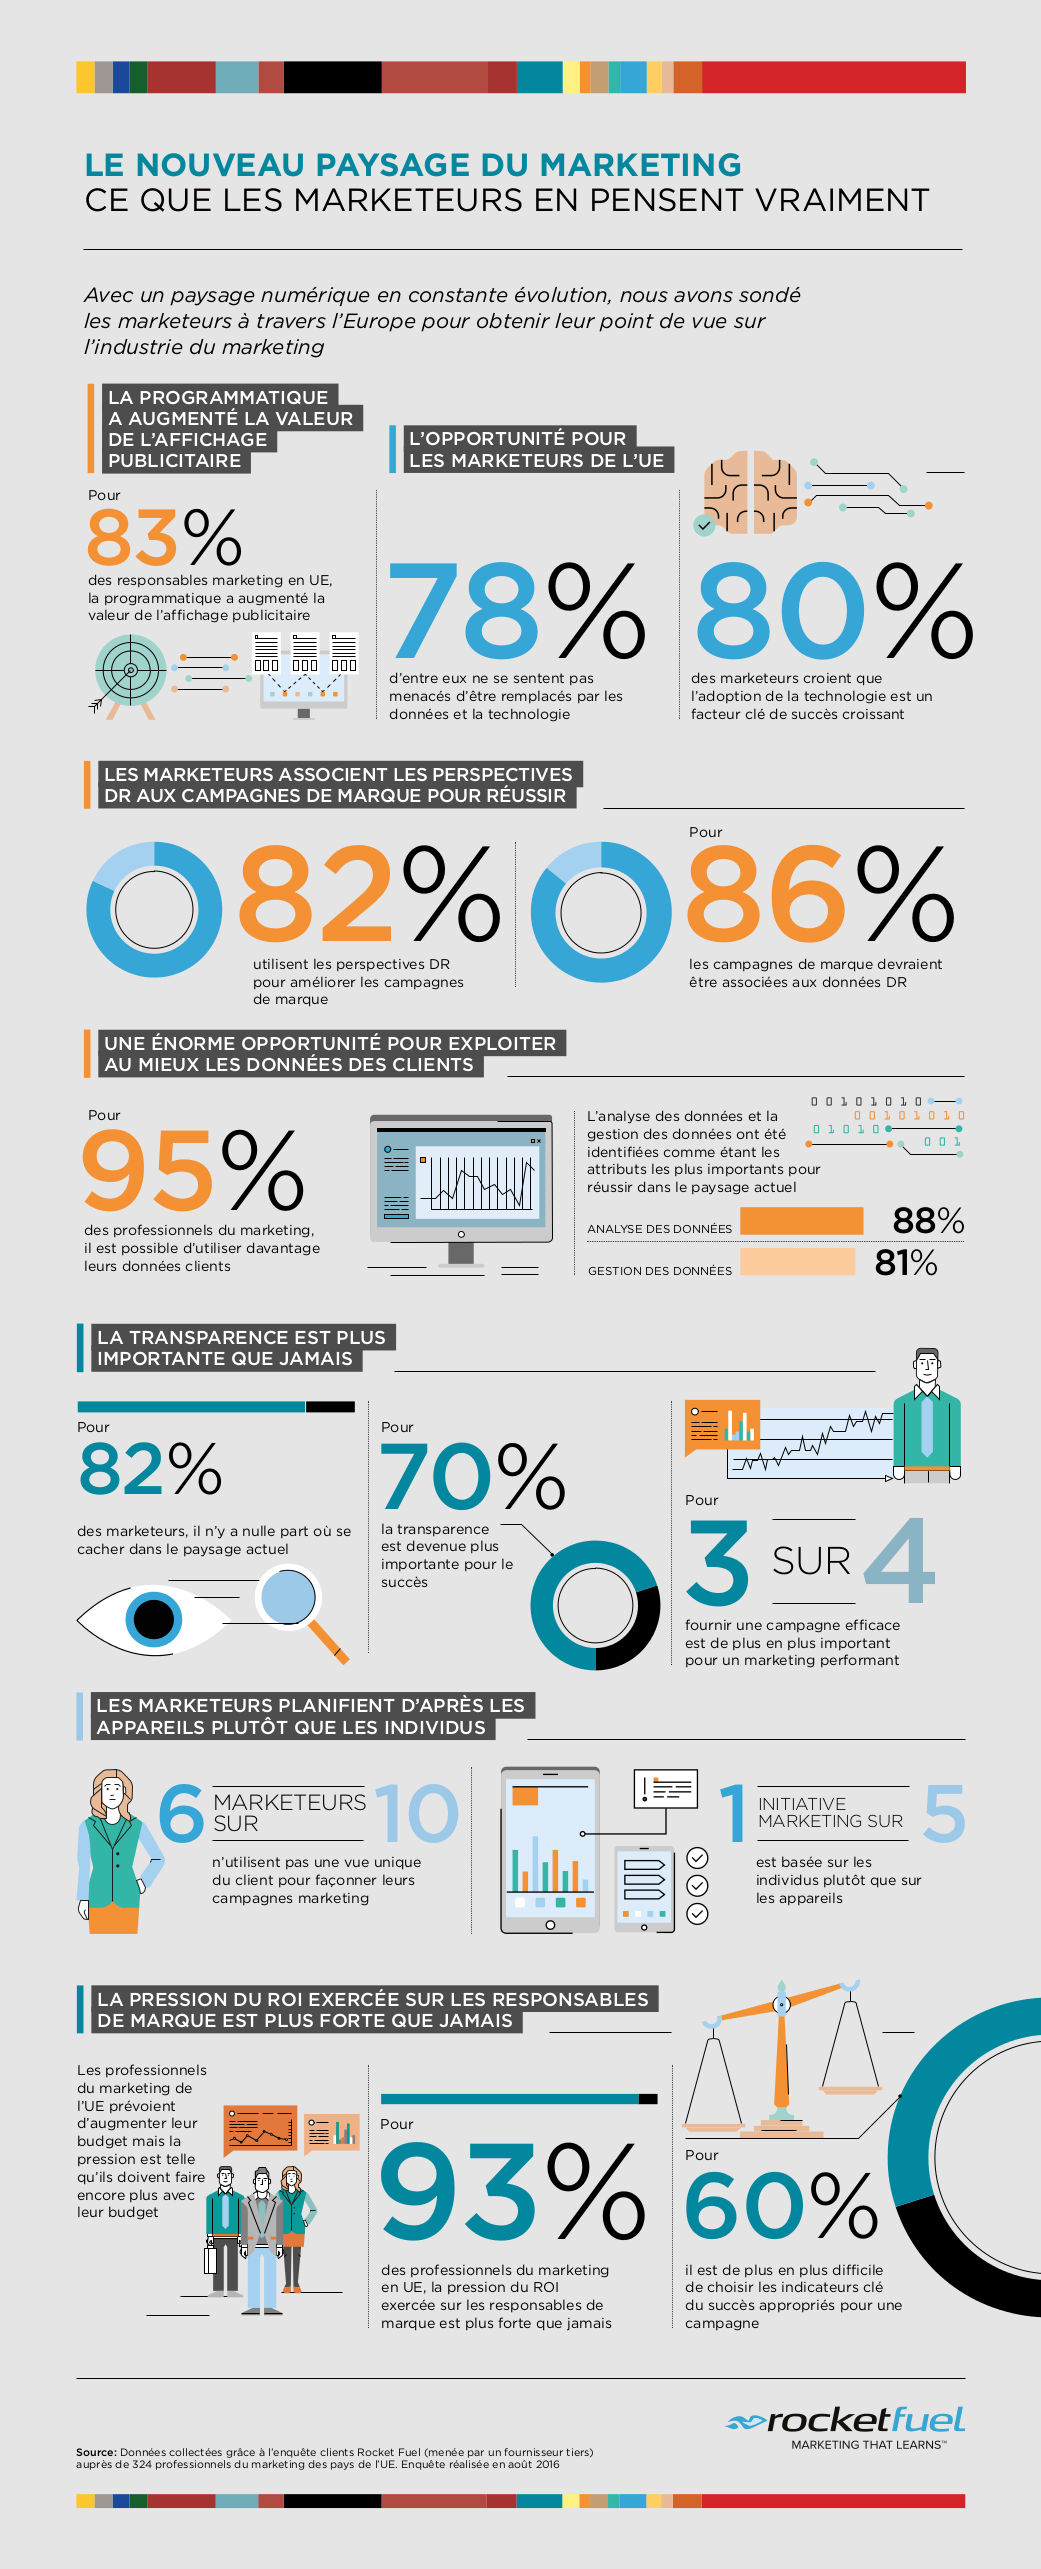 rocketfuel_infographie_marketing